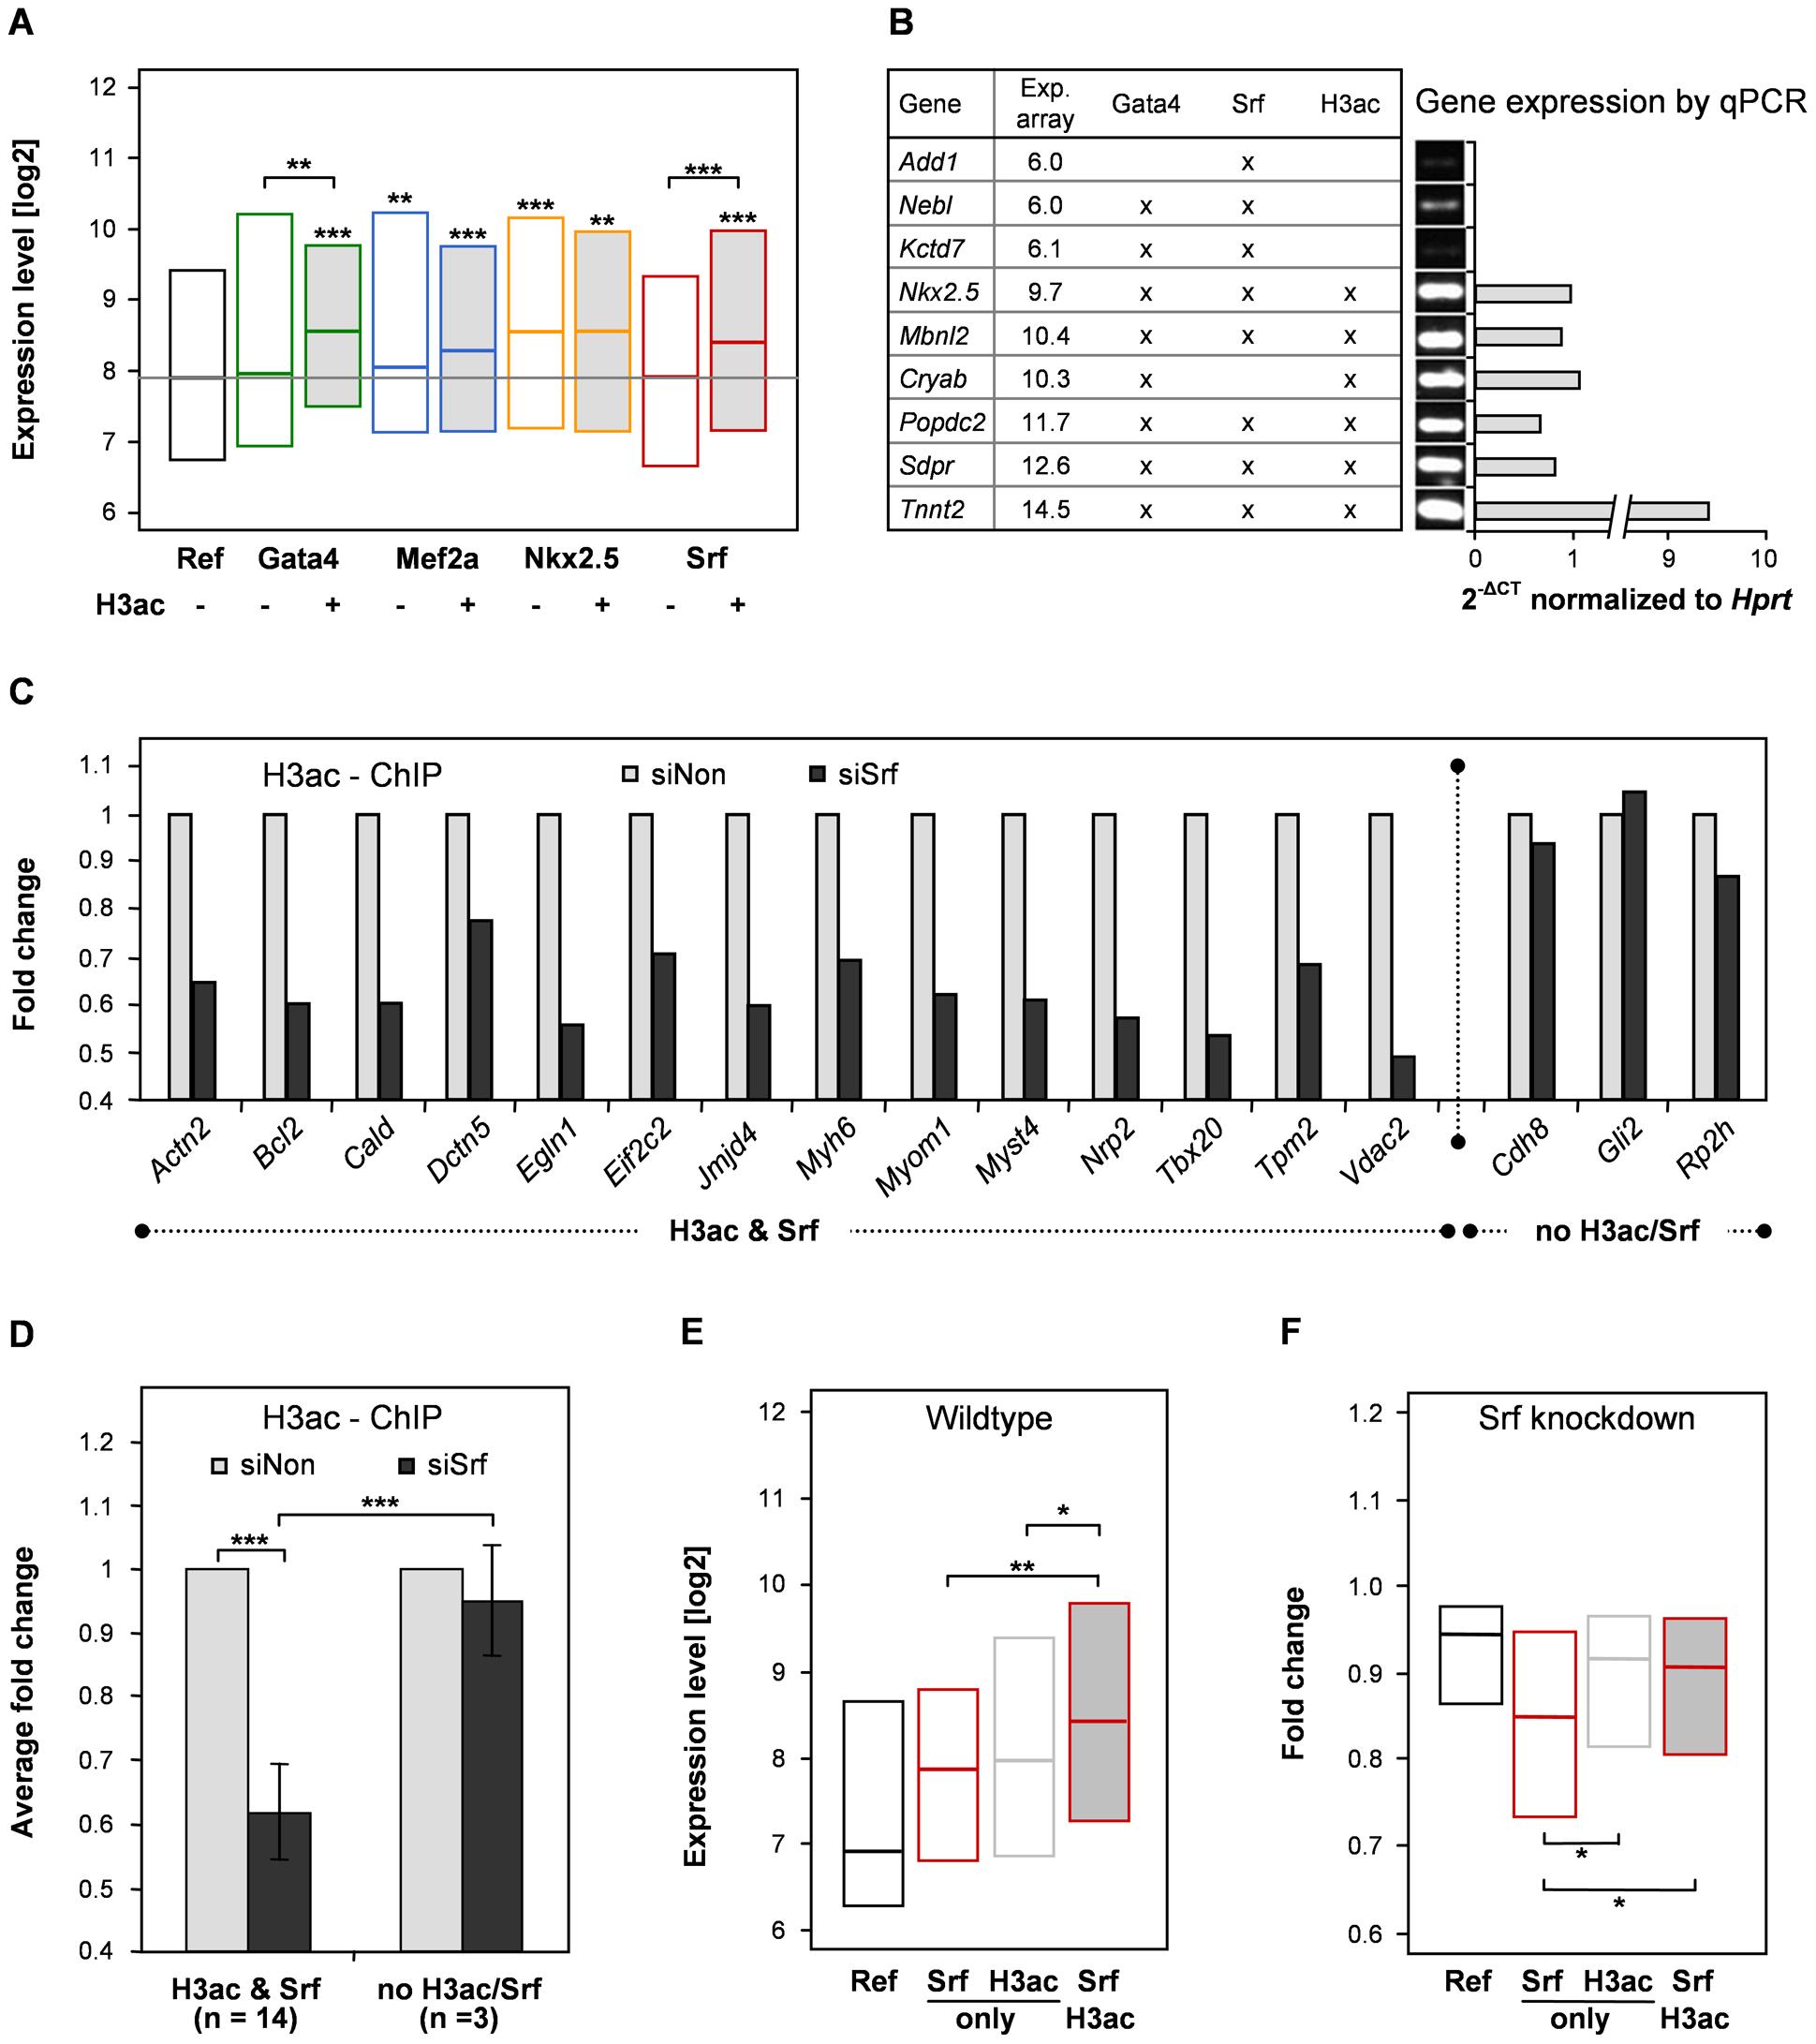 Histone 3 acetylation correlates with target gene expression of Srf and Gata4.